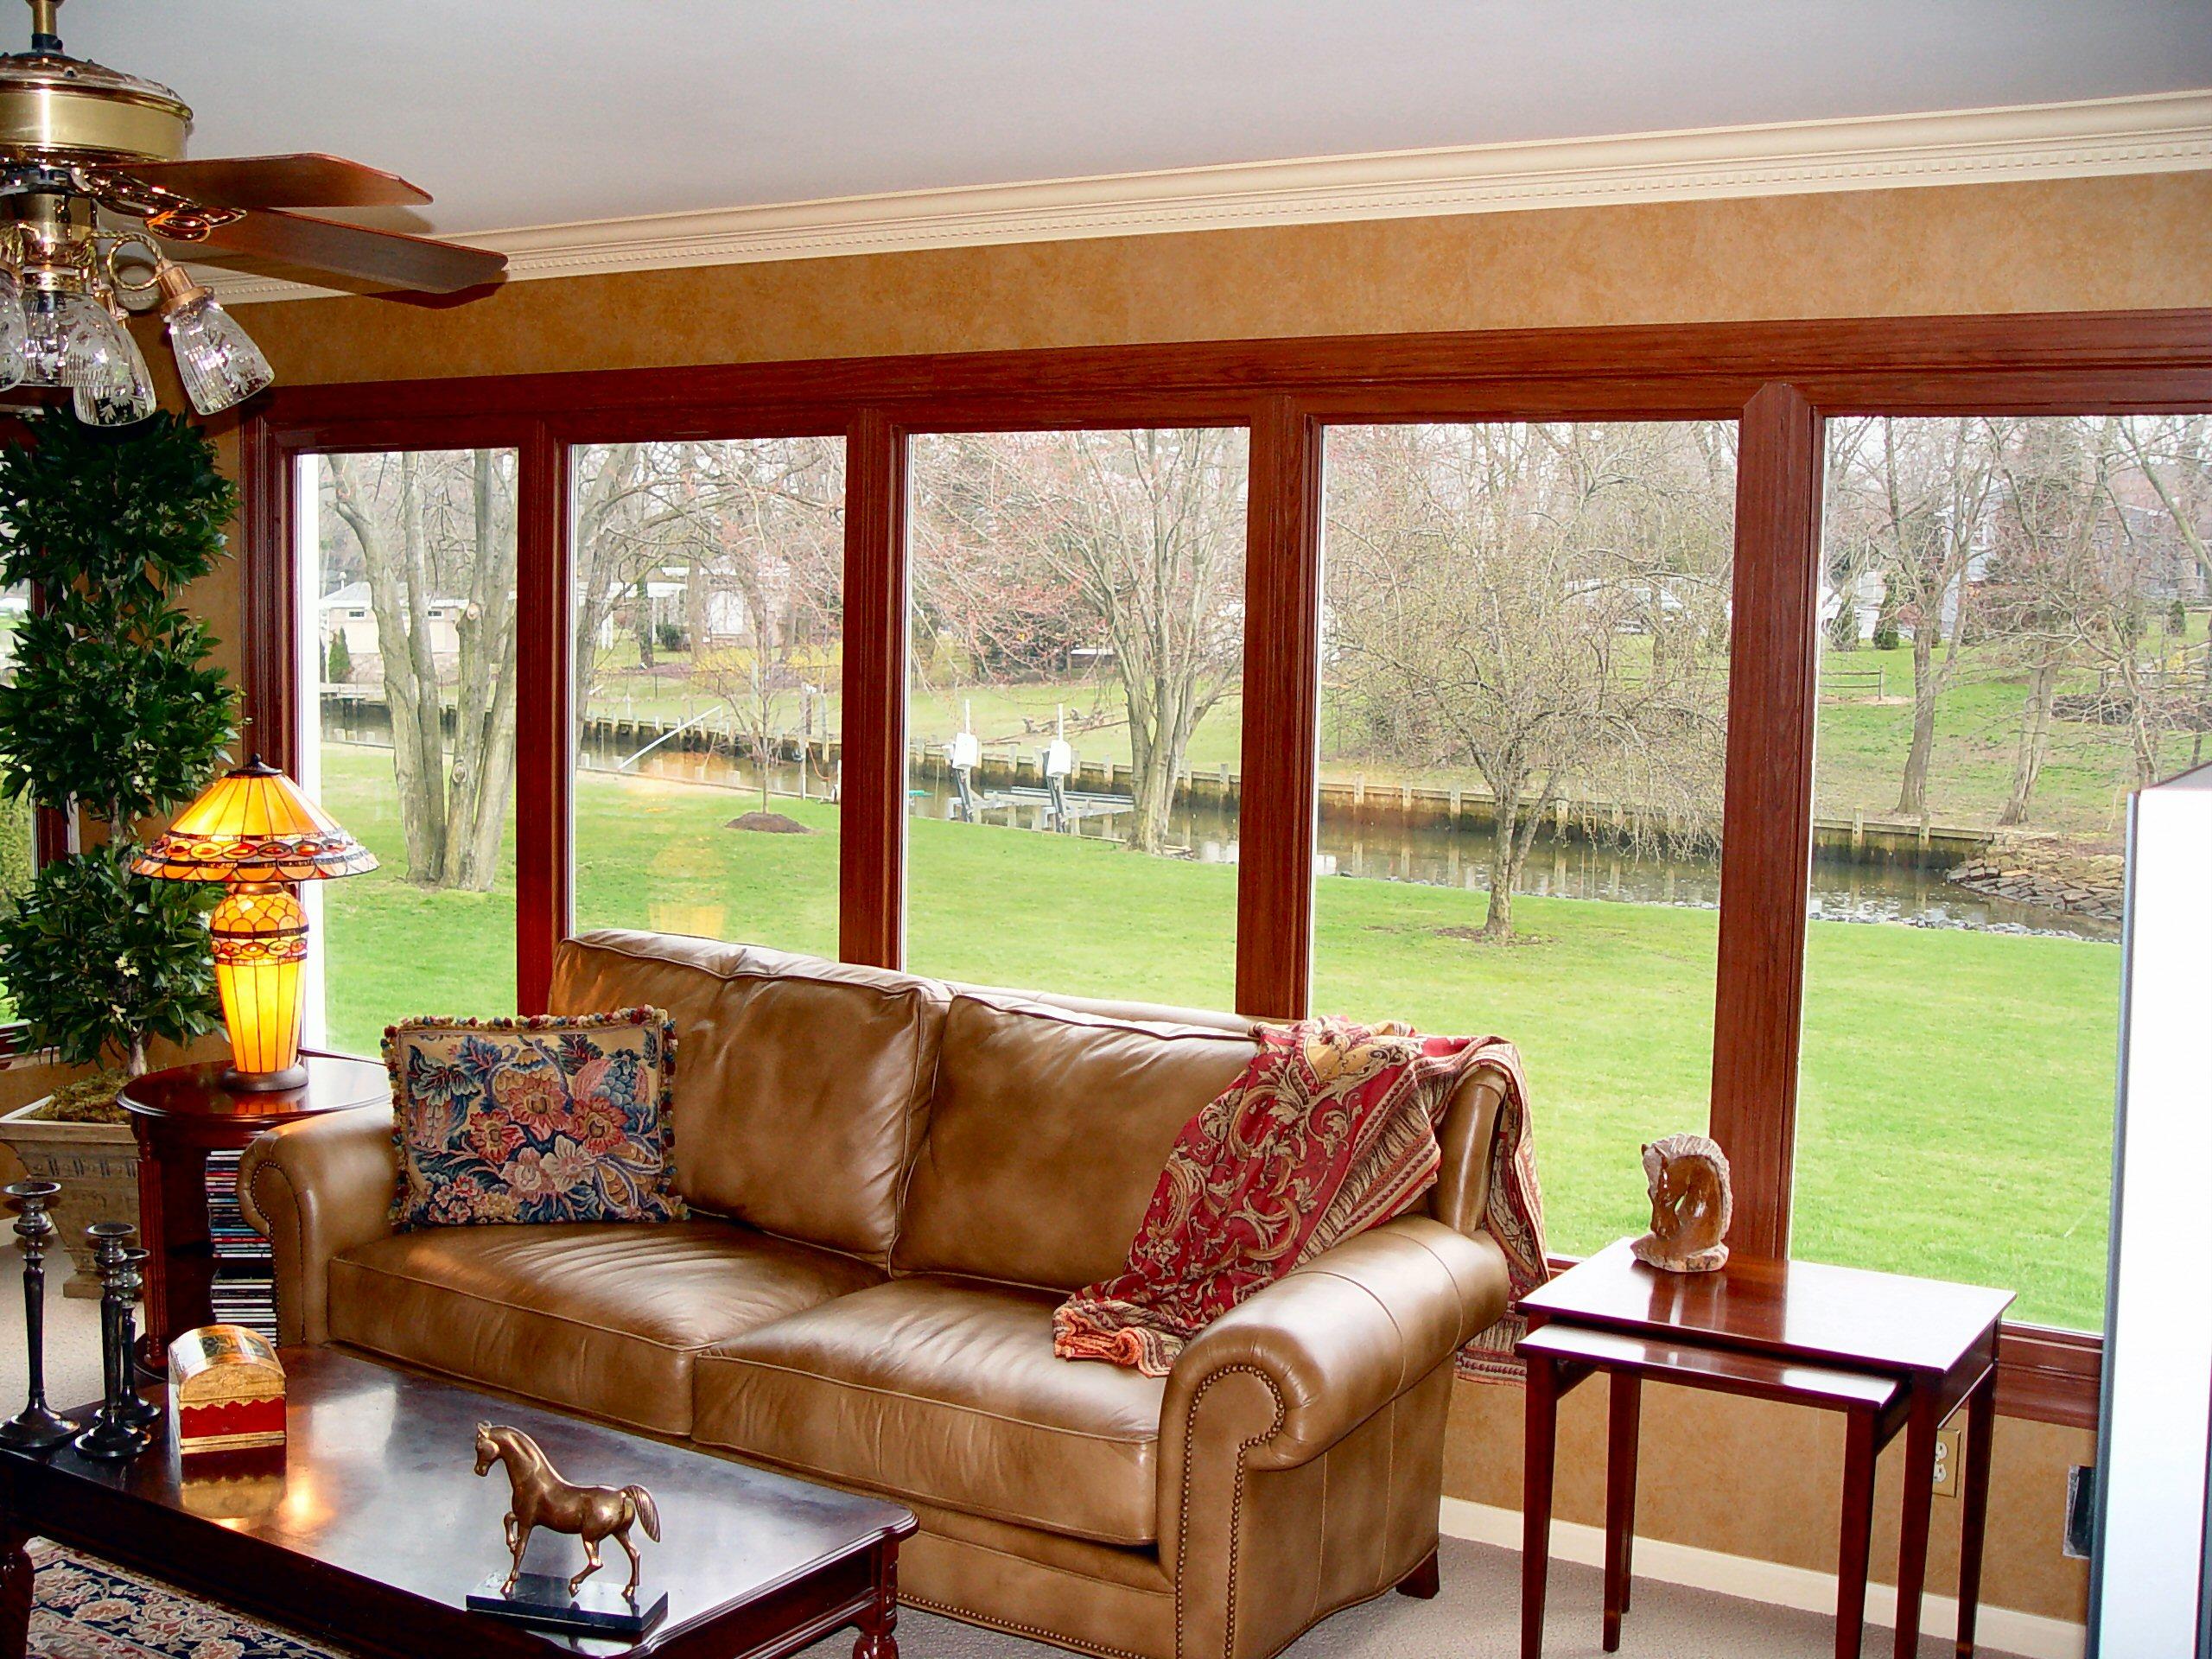 Interior casement window trim - Casement Windows